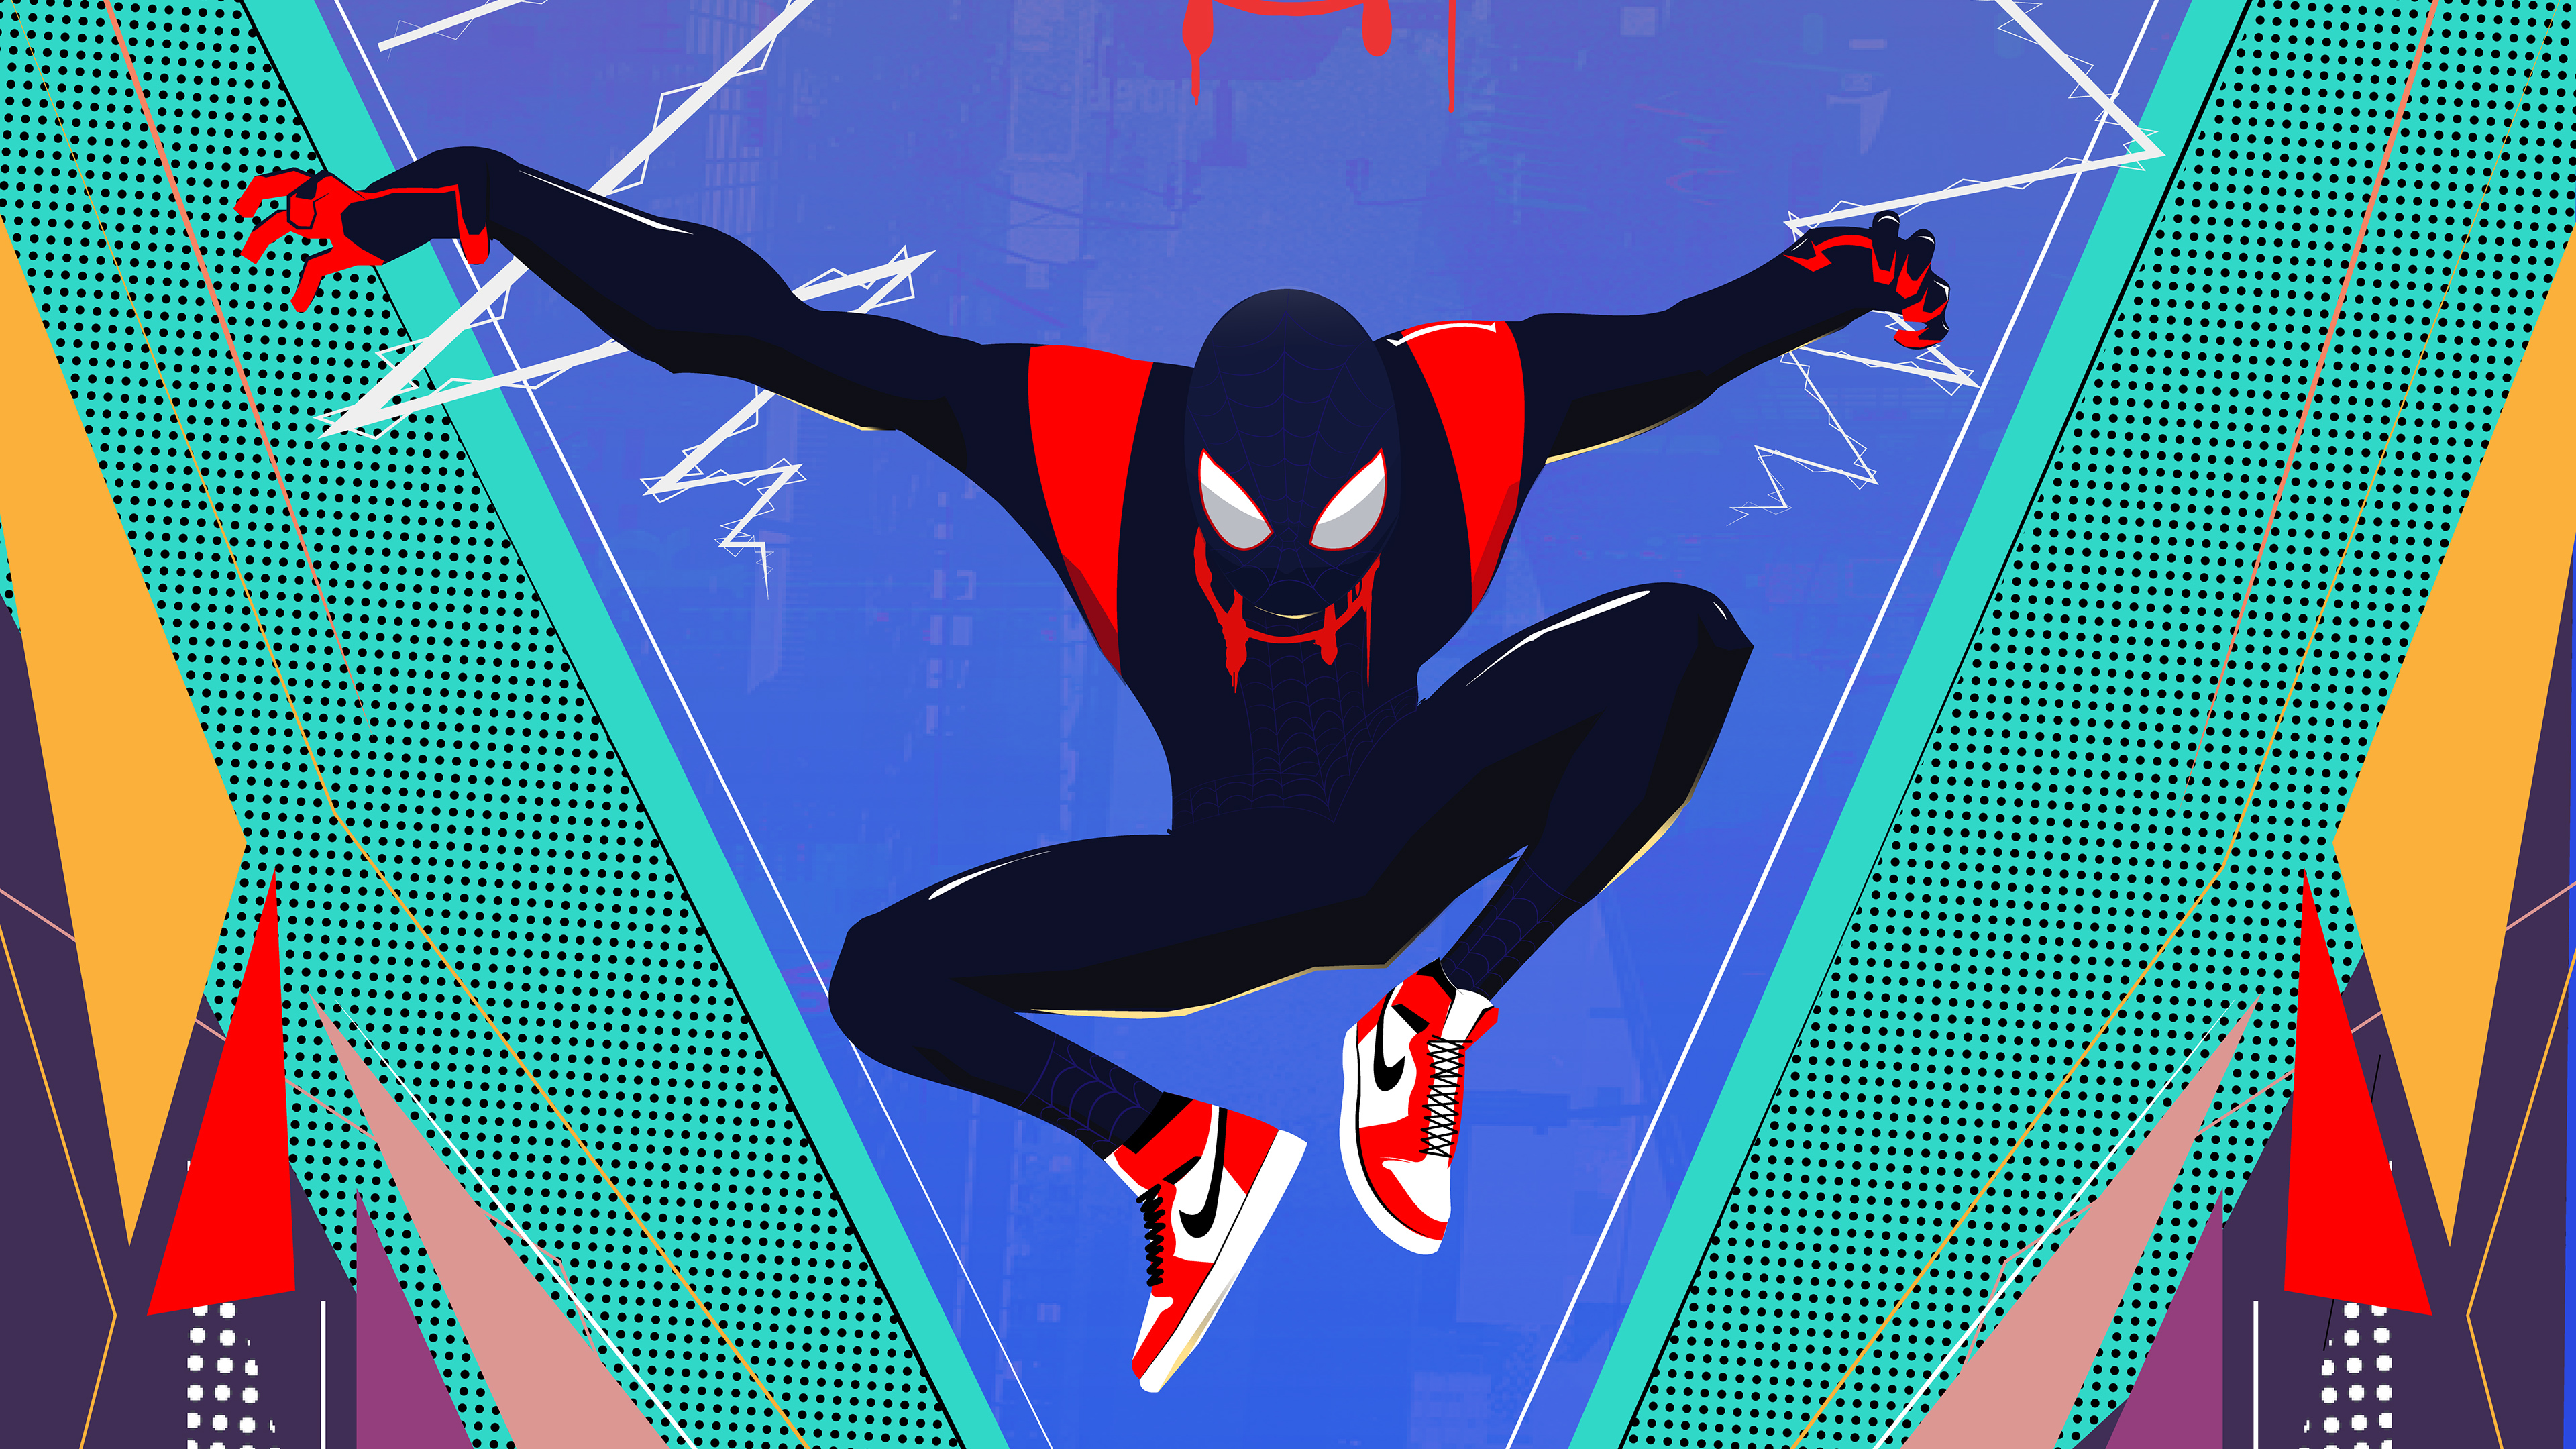 spider man miles morales new 1565053353 - Spider Man Miles Morales New - superheroes wallpapers, spiderman wallpapers, hd-wallpapers, digital art wallpapers, behance wallpapers, artwork wallpapers, art wallpapers, 4k-wallpapers